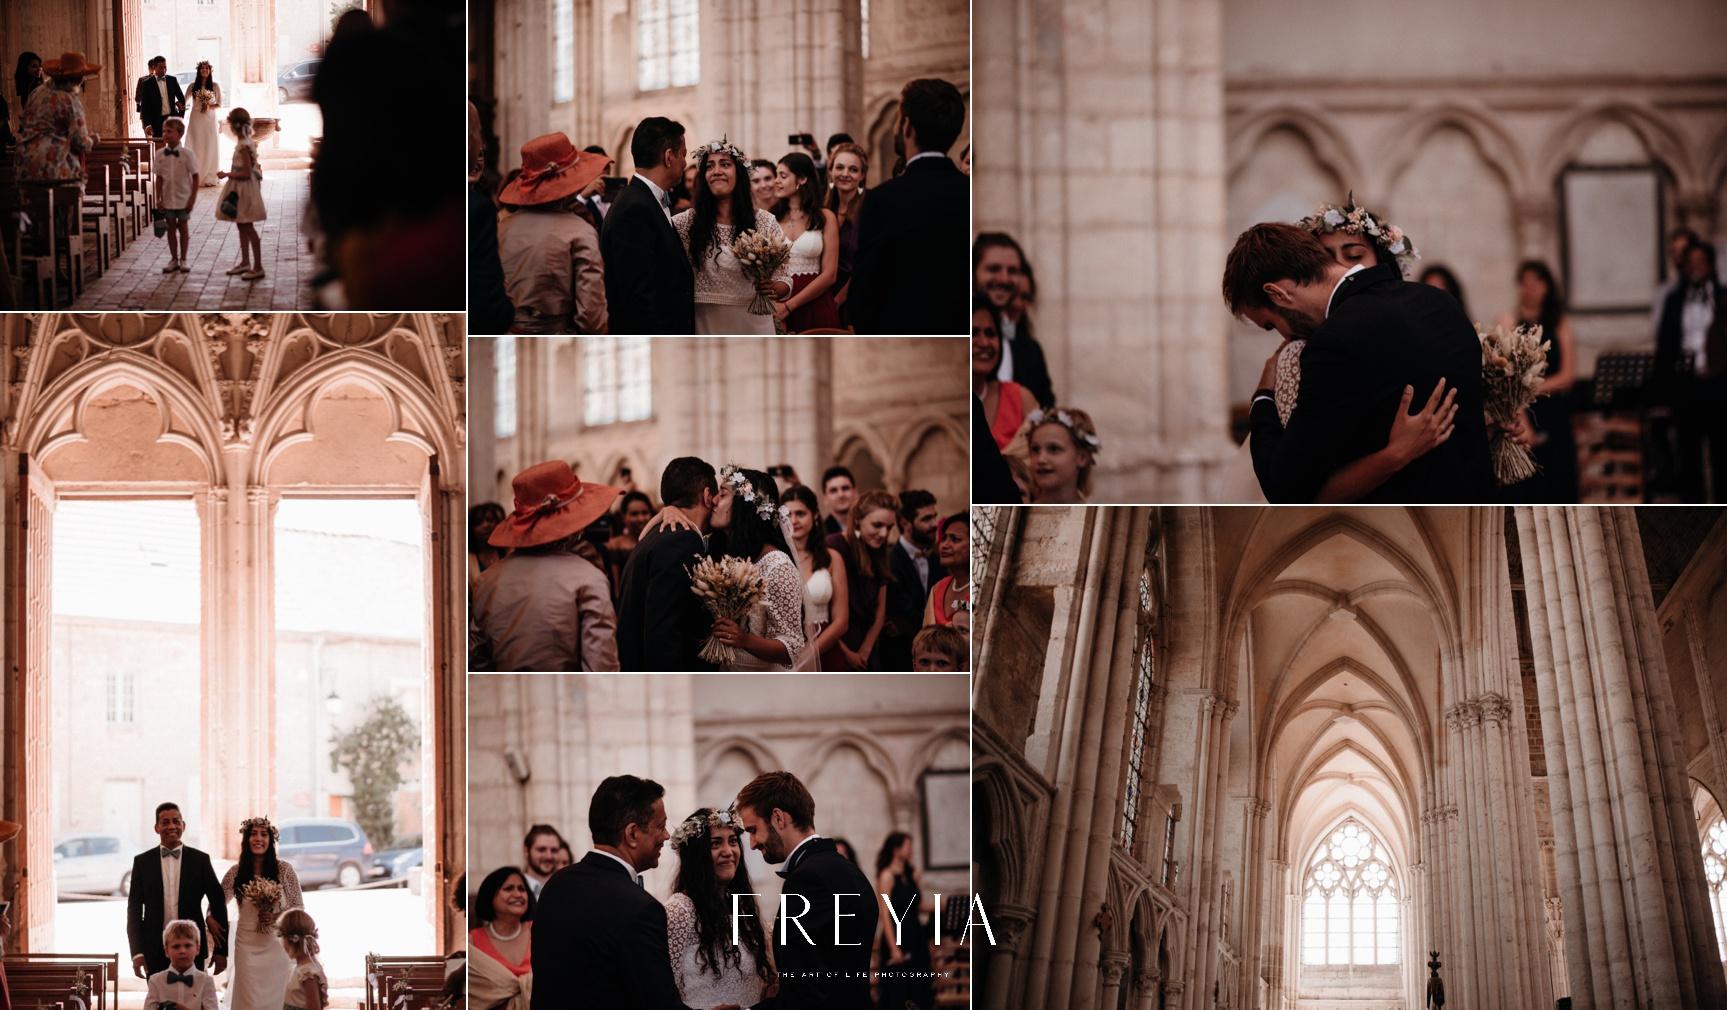 R + T |  mariage reportage alternatif moody intime minimaliste vintage naturel boho boheme |  PHOTOGRAPHE mariage PARIS france destination  | FREYIA photography_-140.jpg